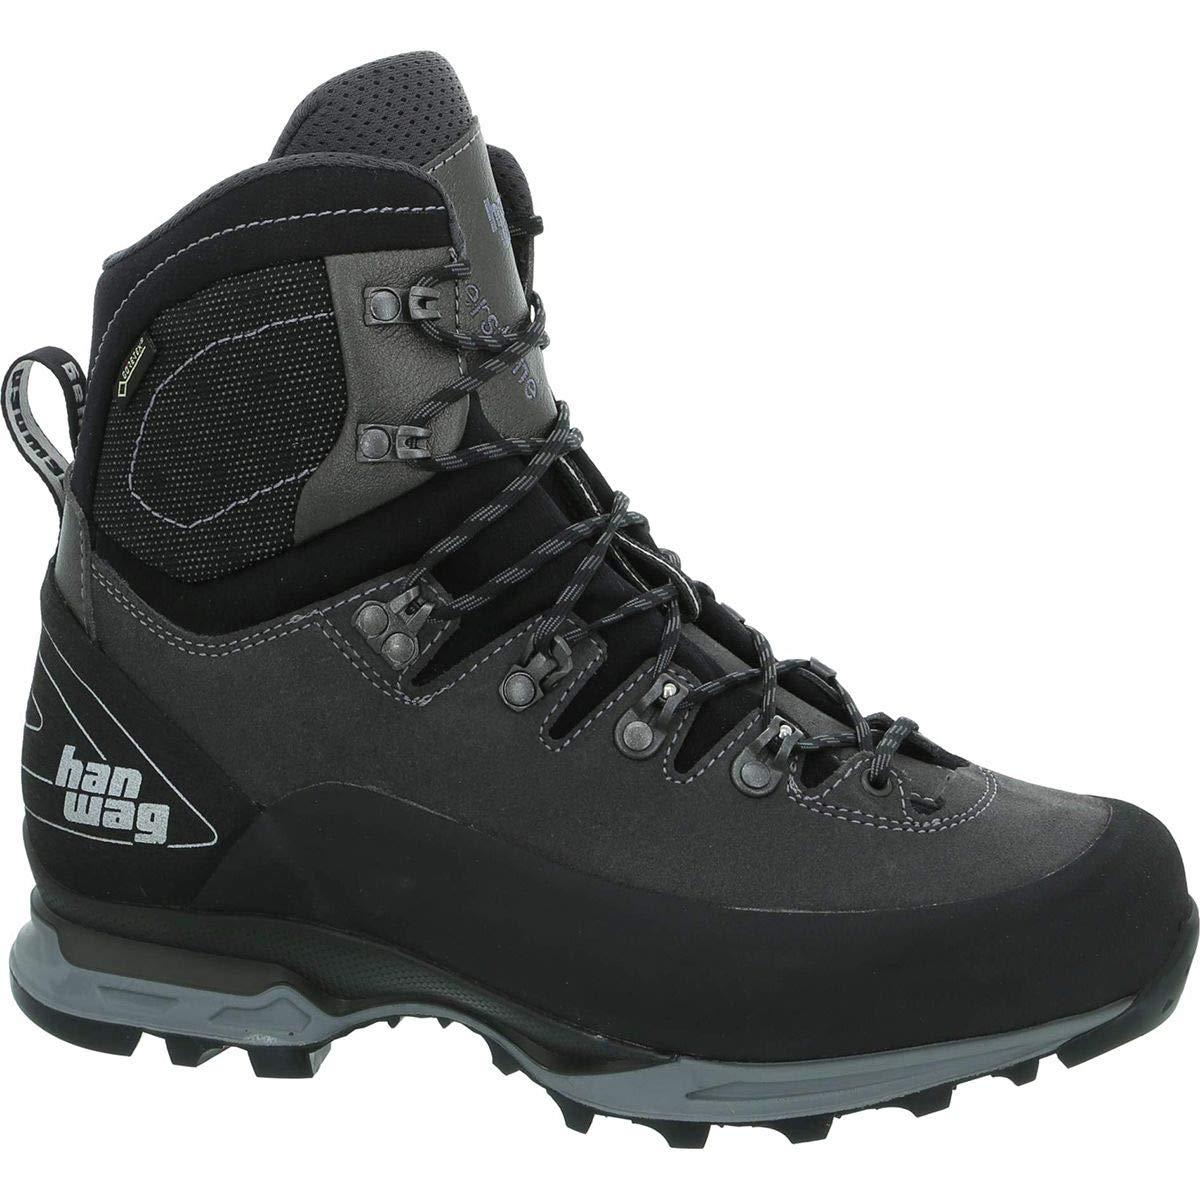 Hanwag Alverstone II GTX Backpacking Boot - Men's Asphalt/Light Grey, US 11.5/UK 10.5 by Hanwag